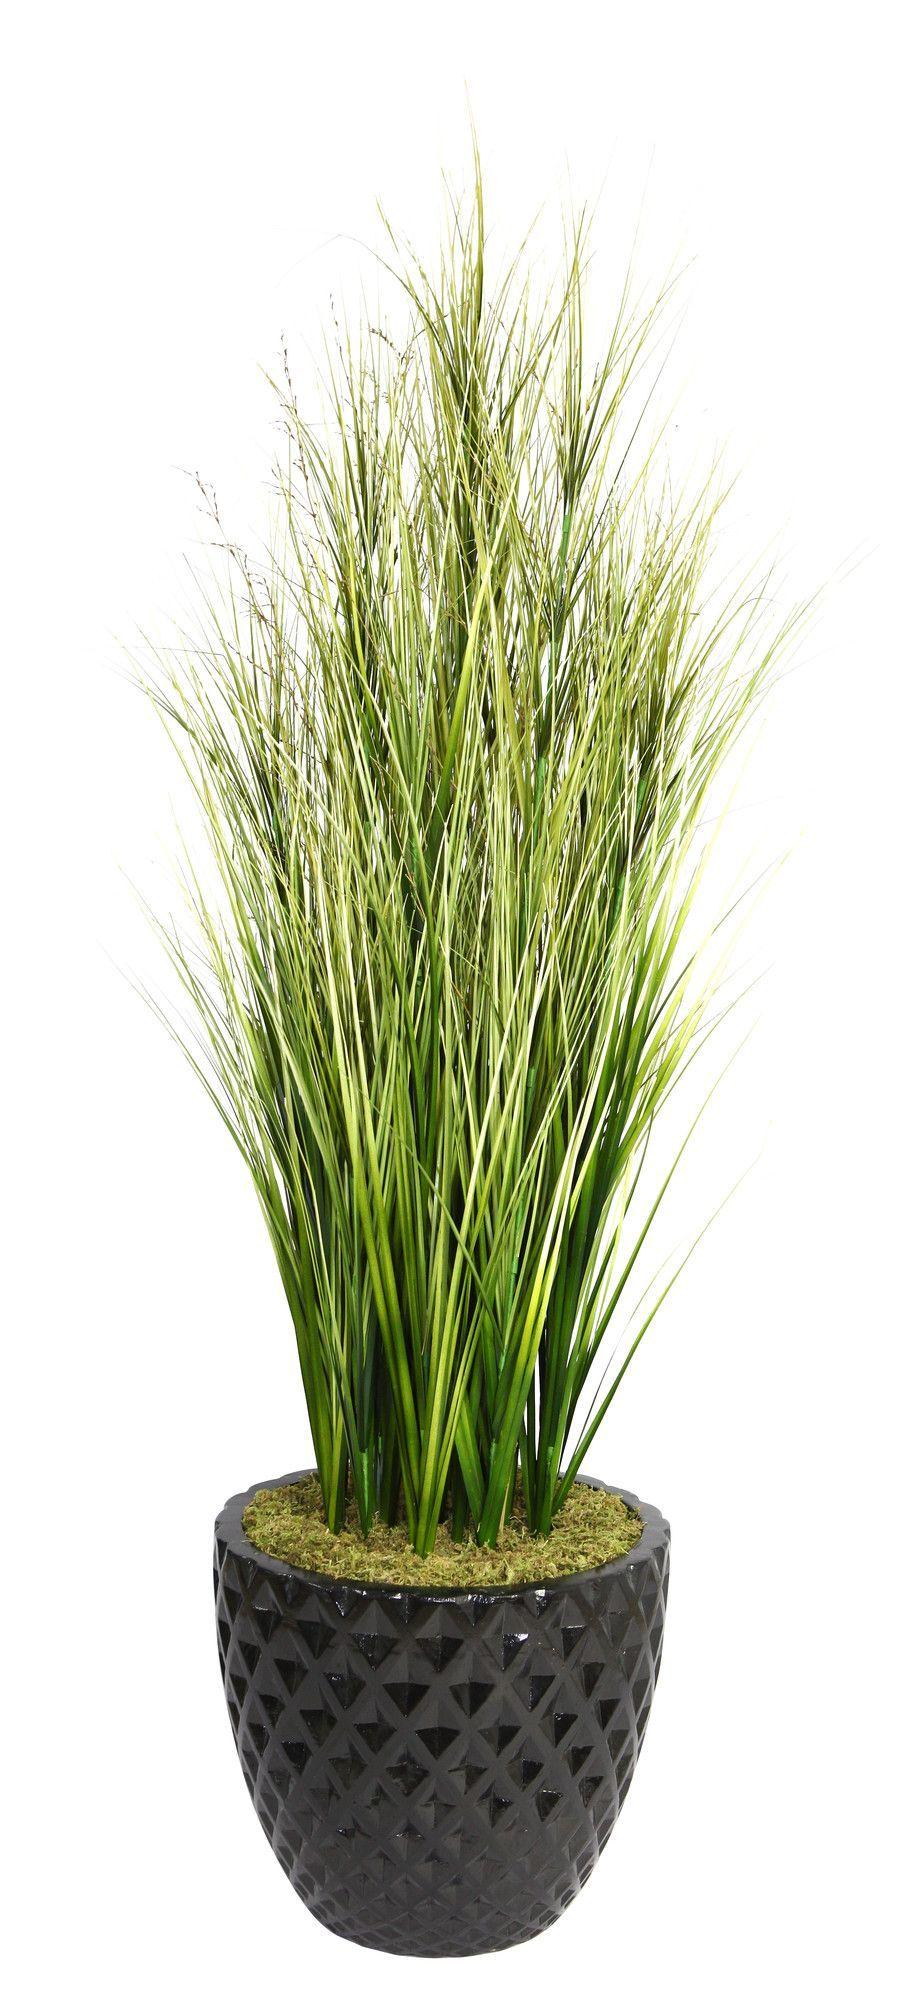 Tall Onion Grass in Round Tapered Fiberstone Pot